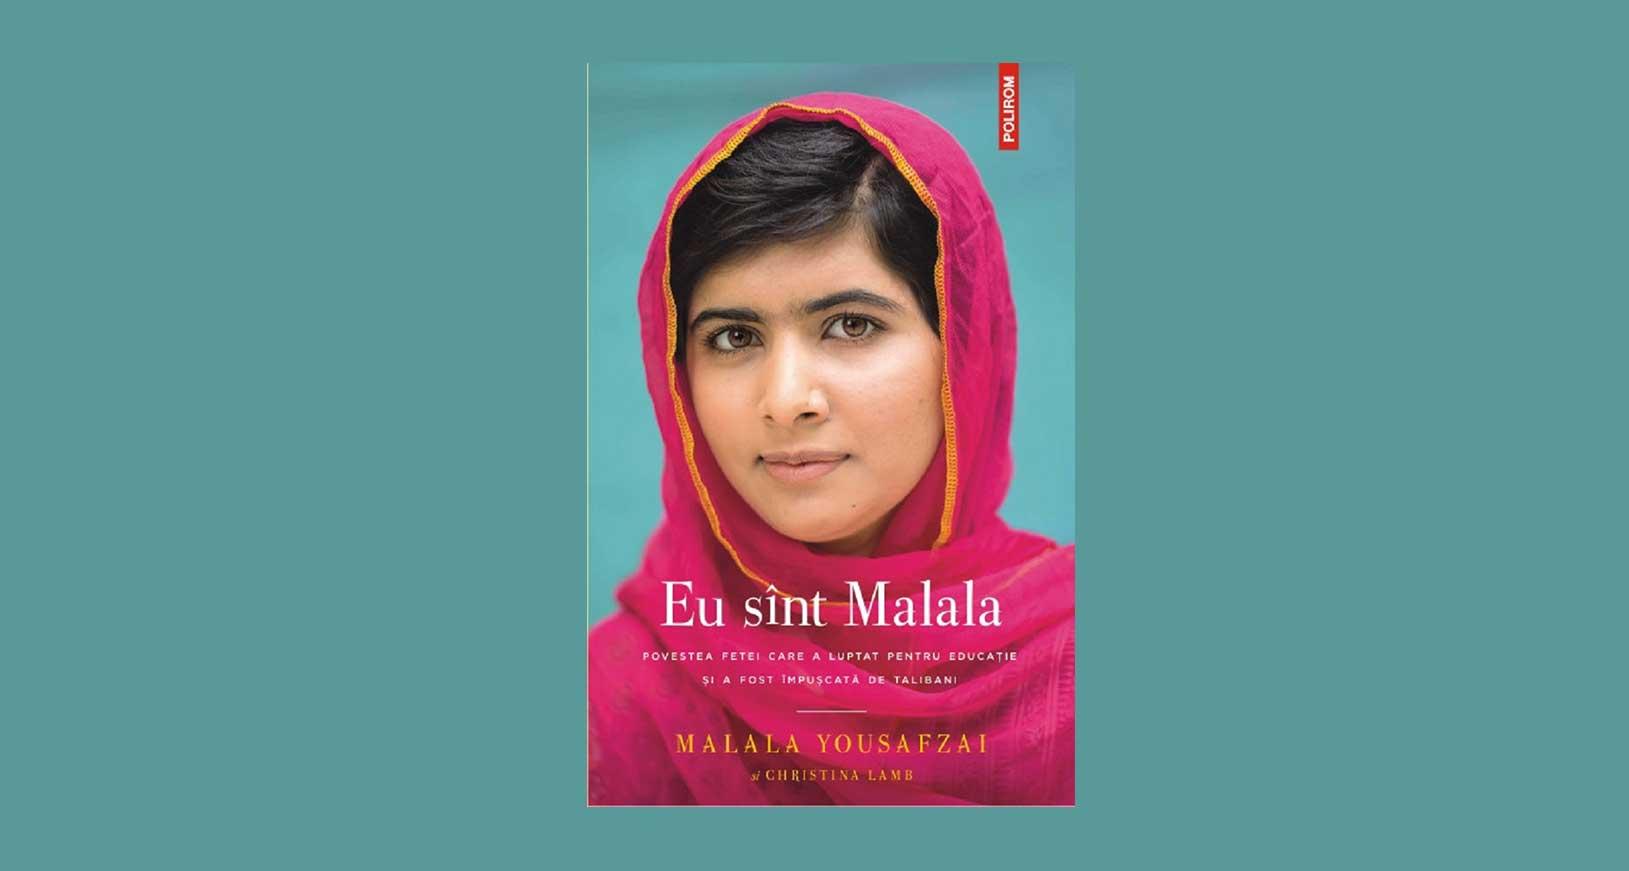 Eu sunt Malala - Malala Yousafzai, Christina Lamb